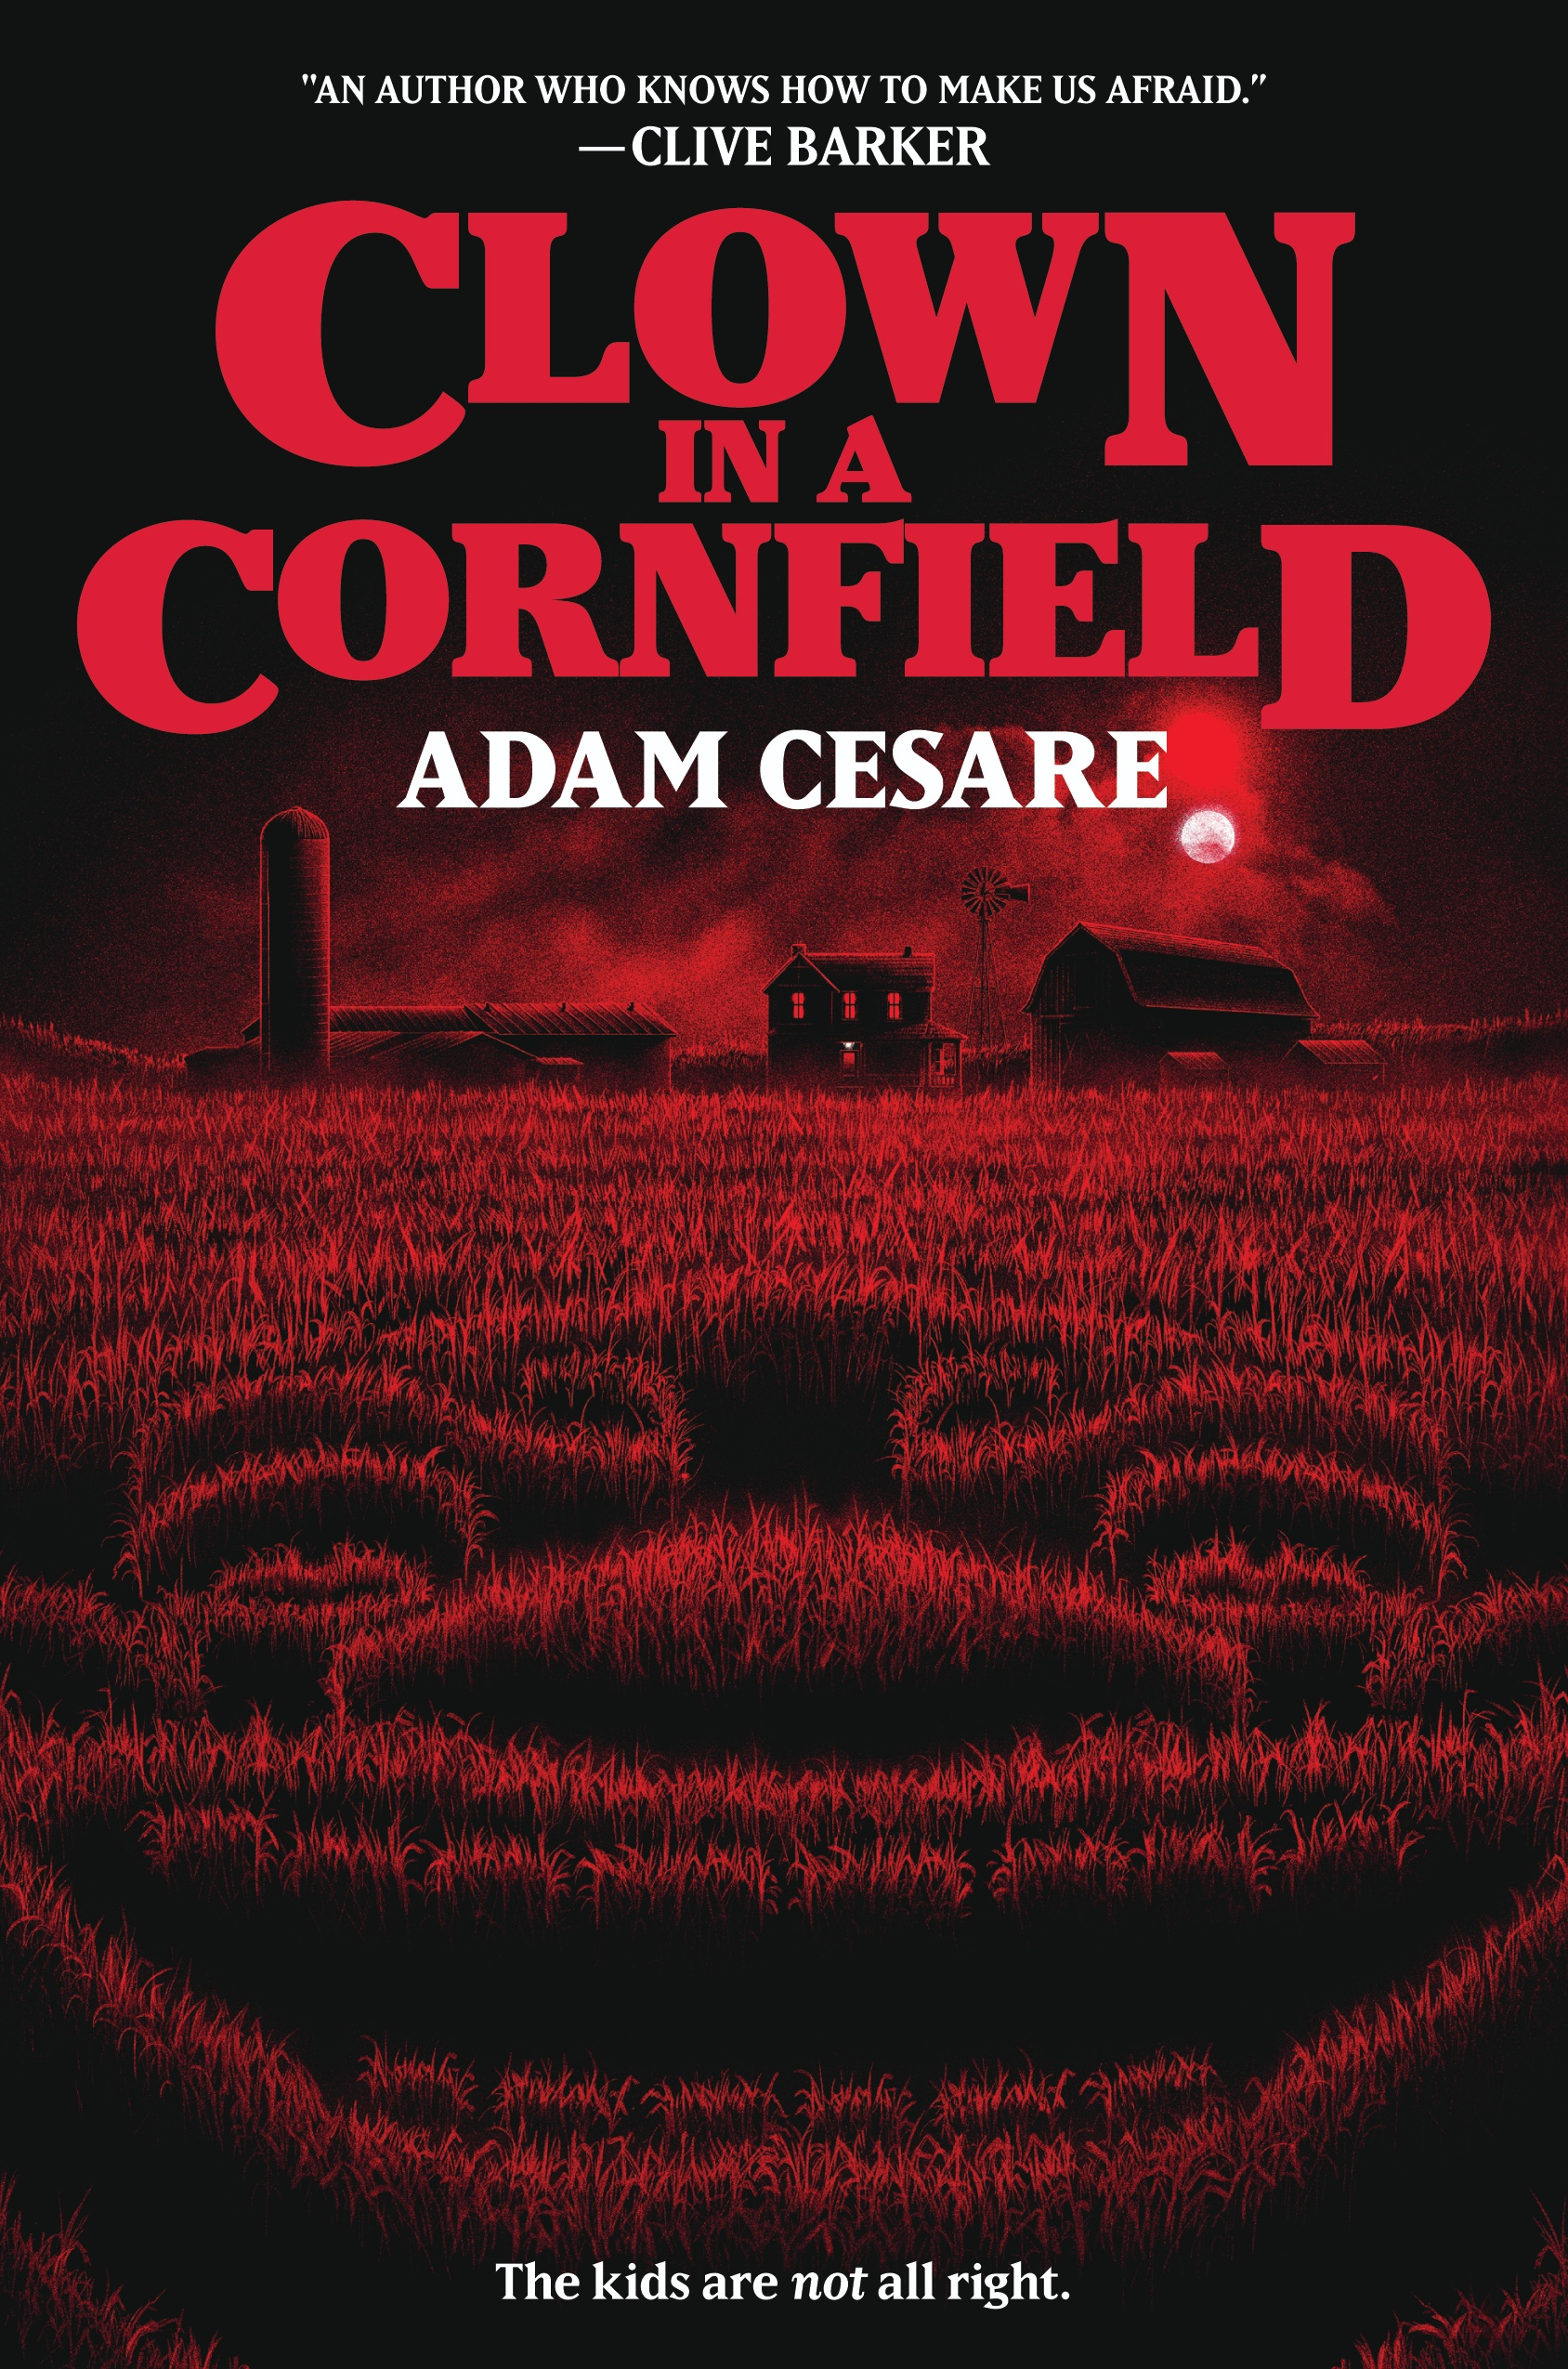 Clown in a Cornfield Adam Cesare